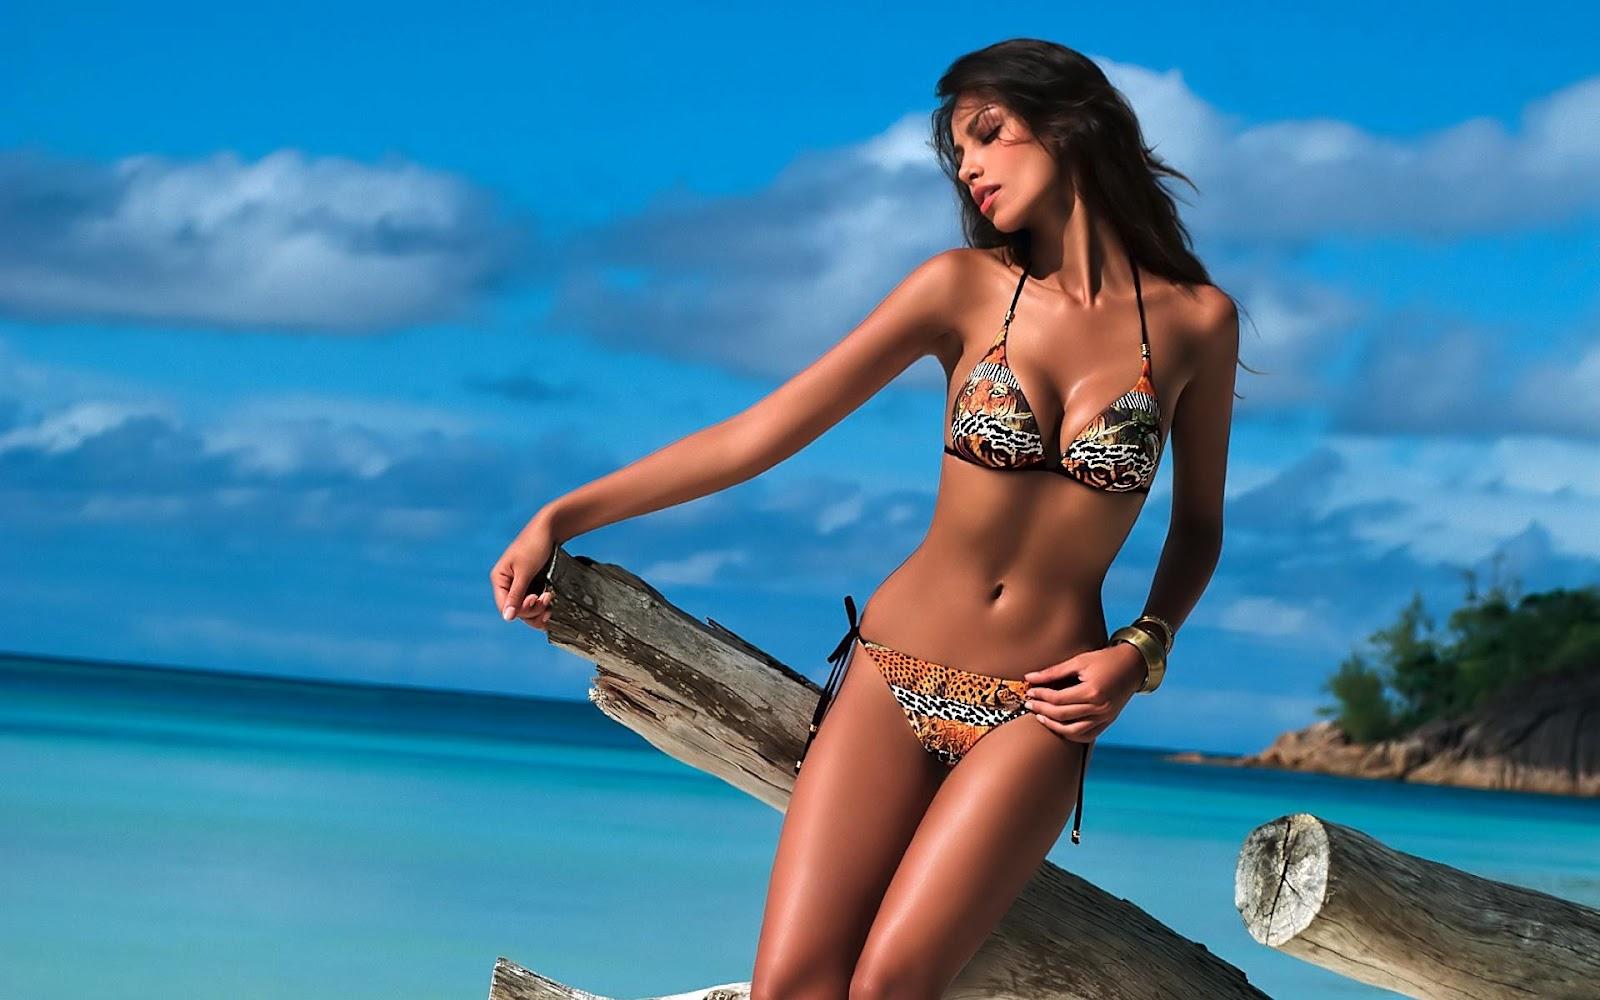 Bikini Girls | Desktop Wallpapers